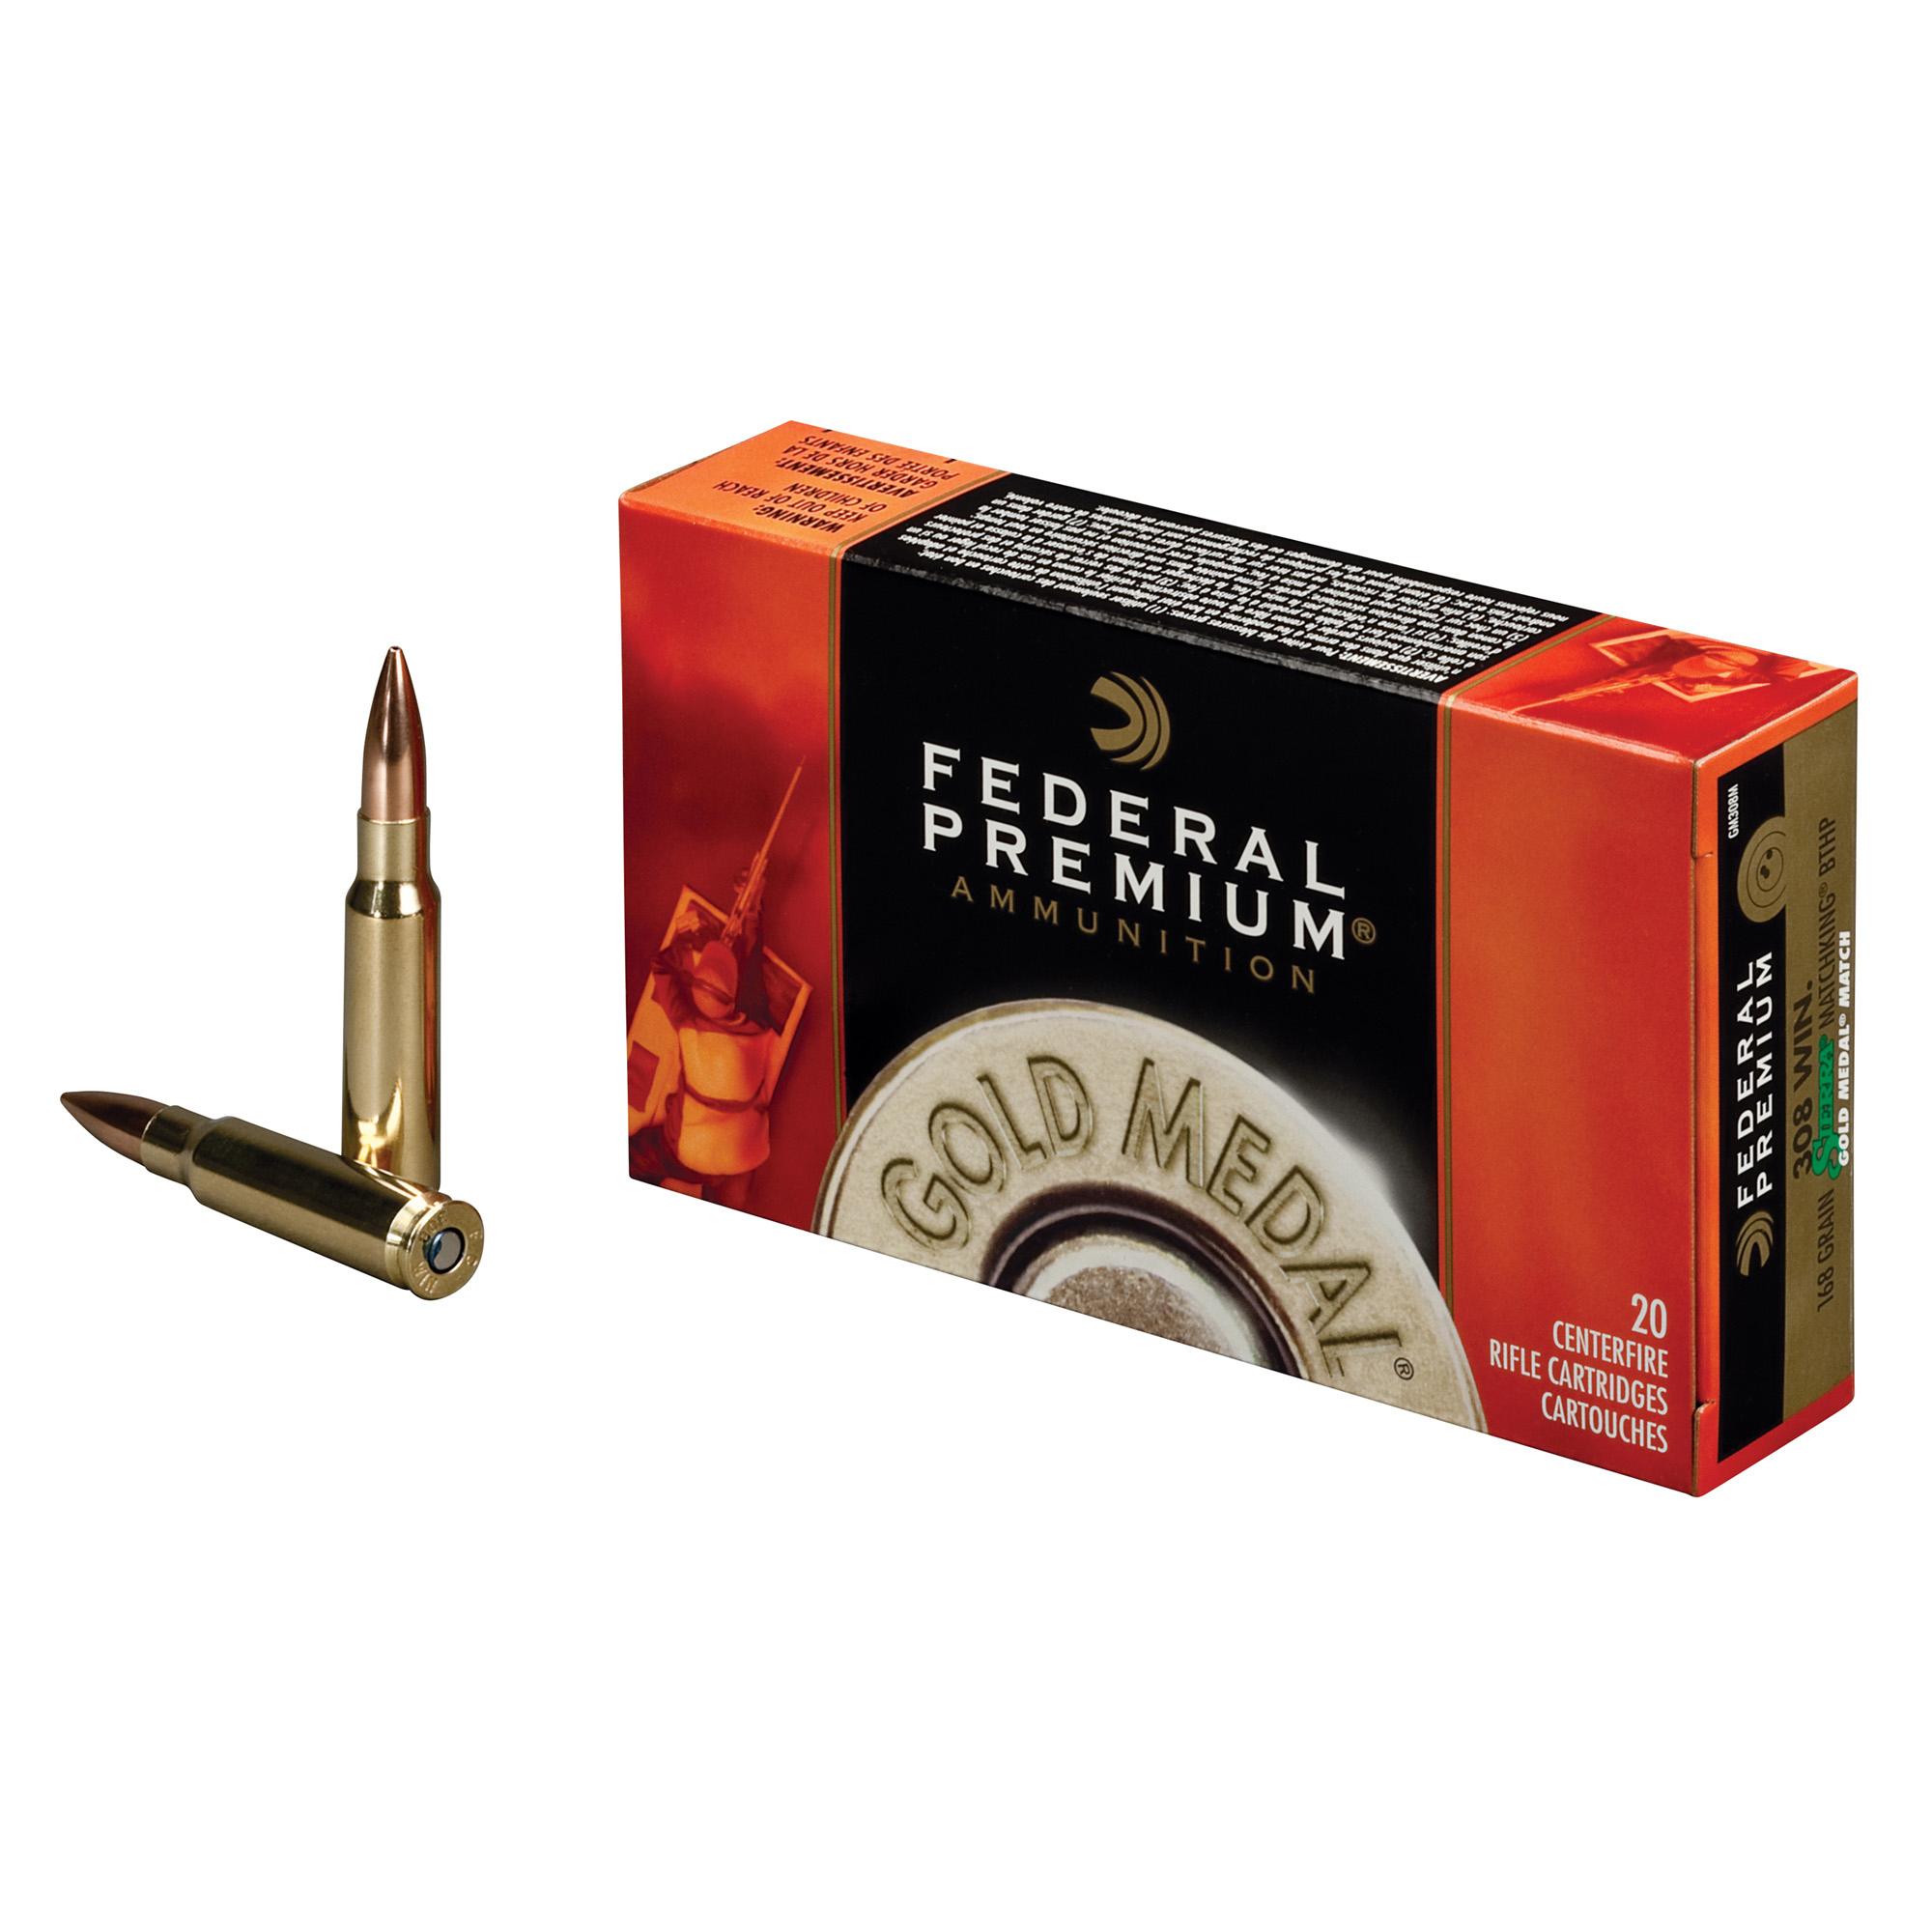 Federal Premium Gold Medal Ammo, .308 Win, 168-gr, SMK-BTHP